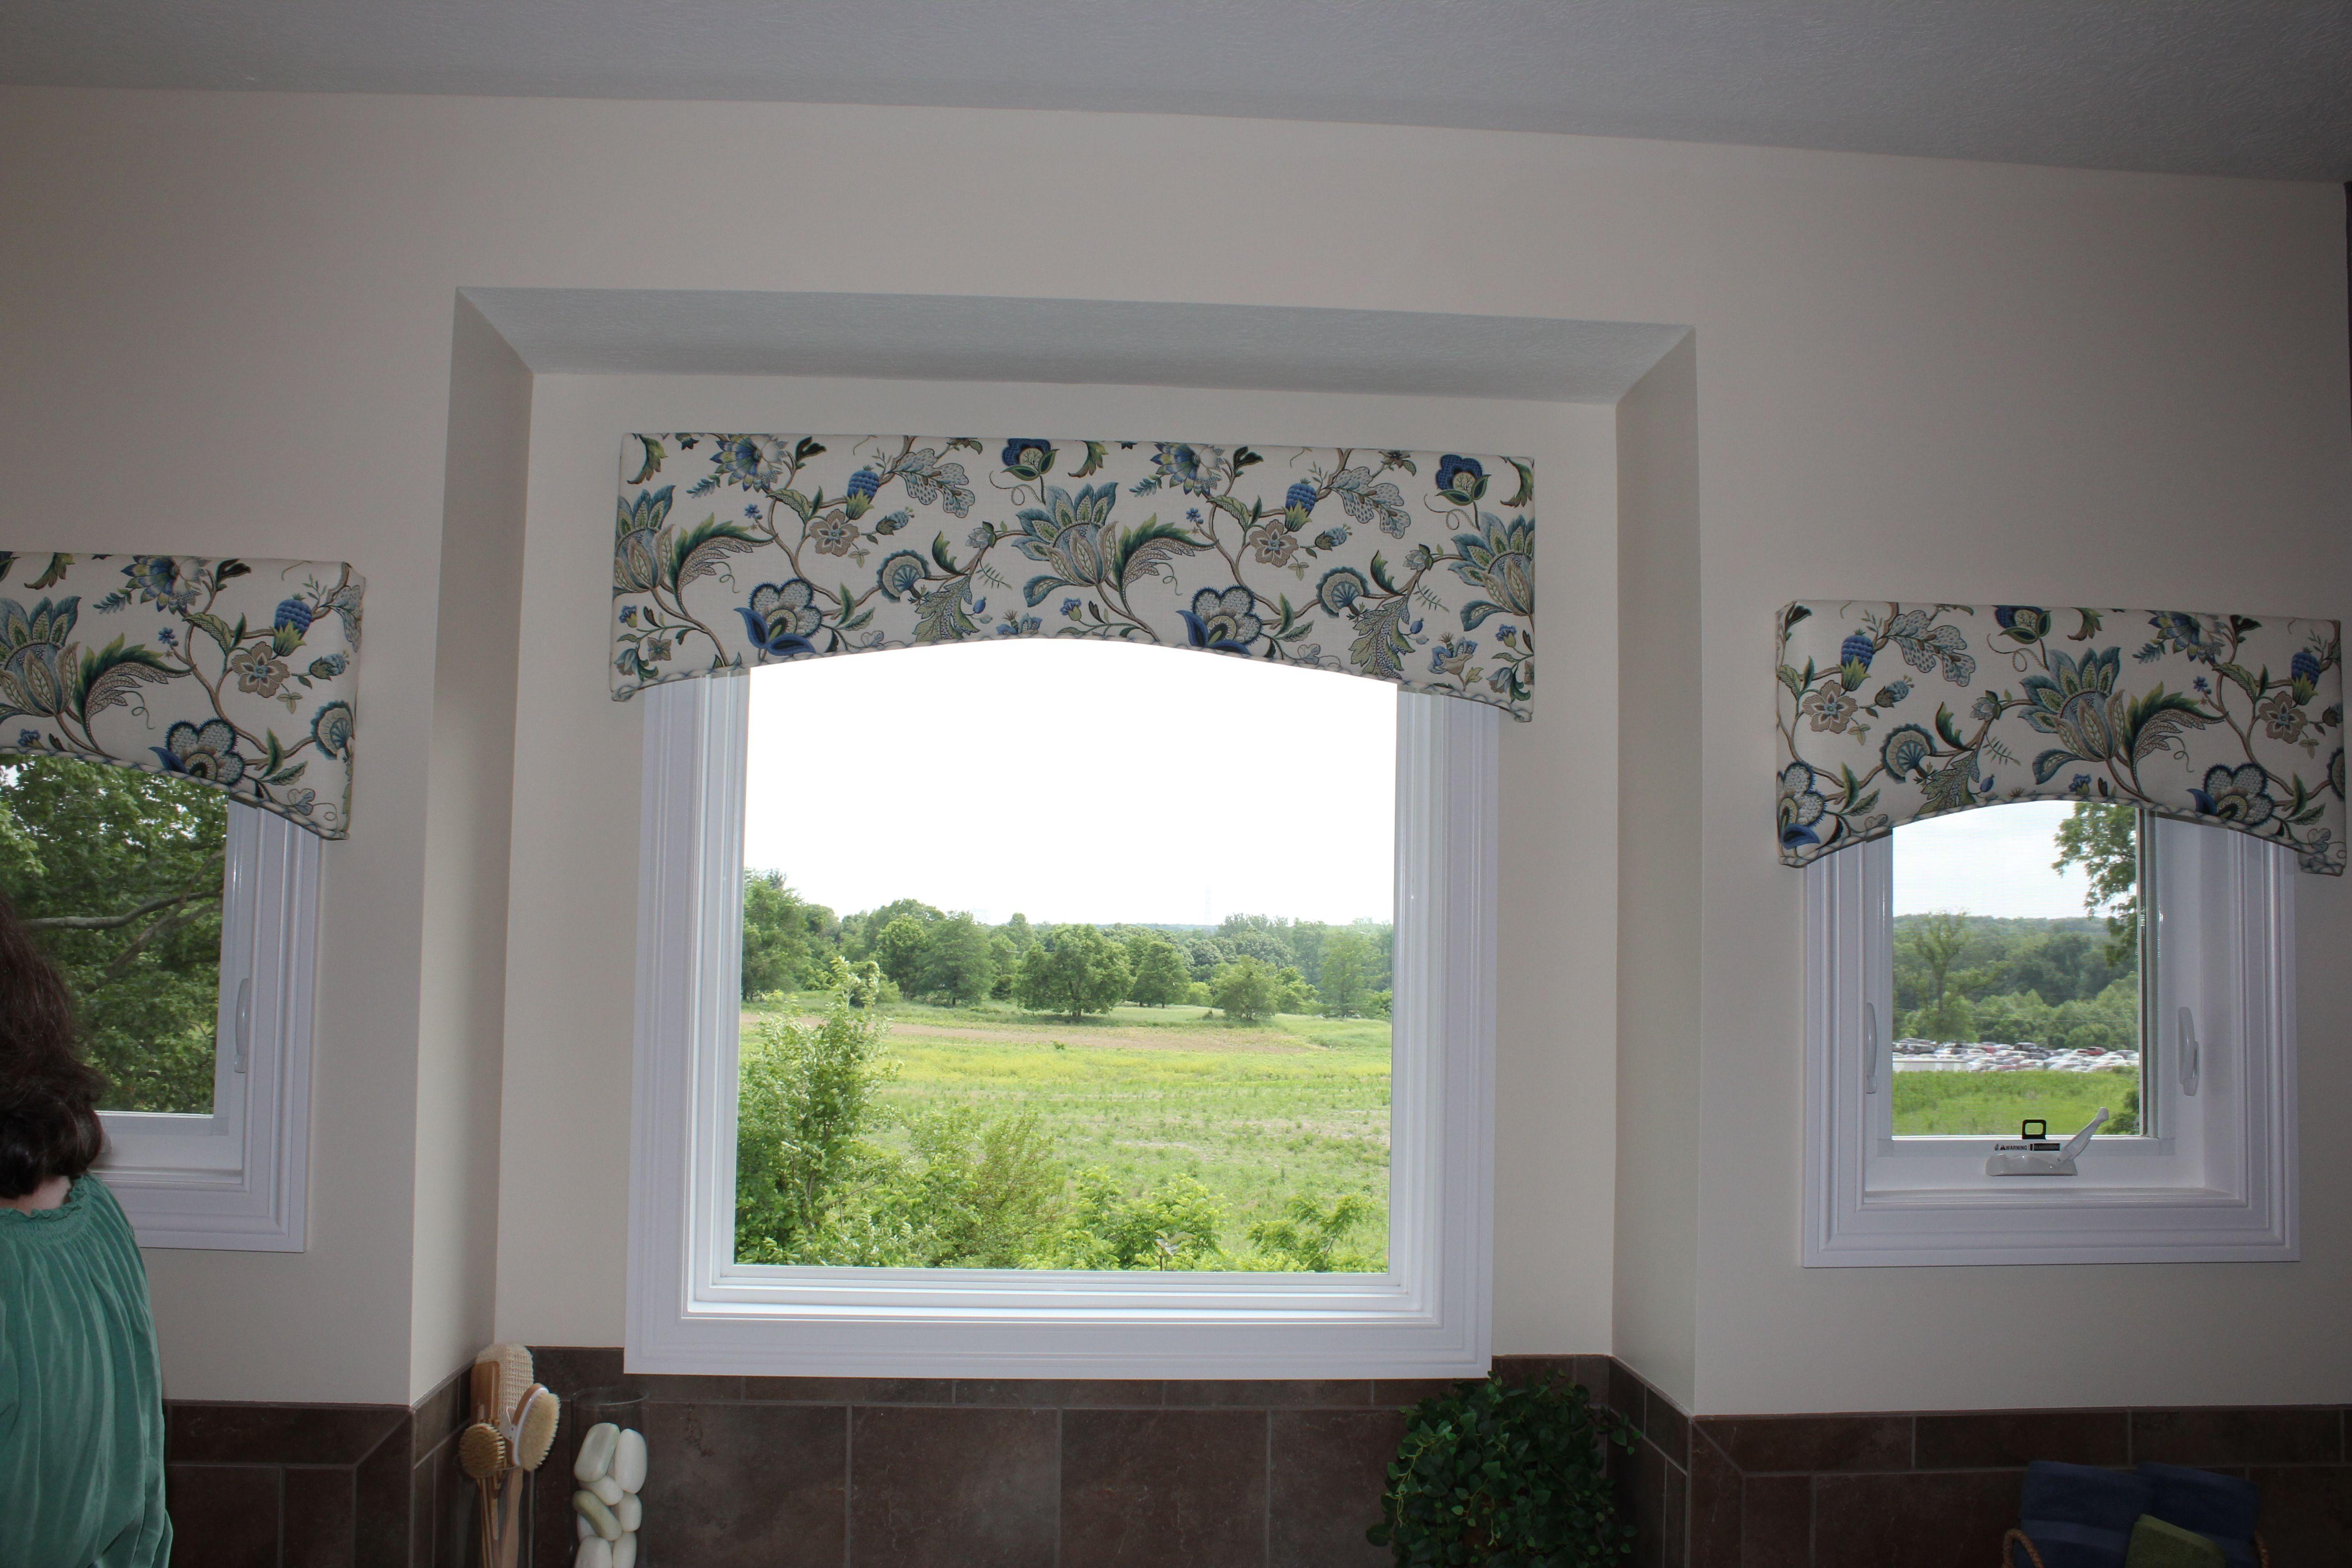 Bathroom valance | Bathroom valance, Bathroom windows ...